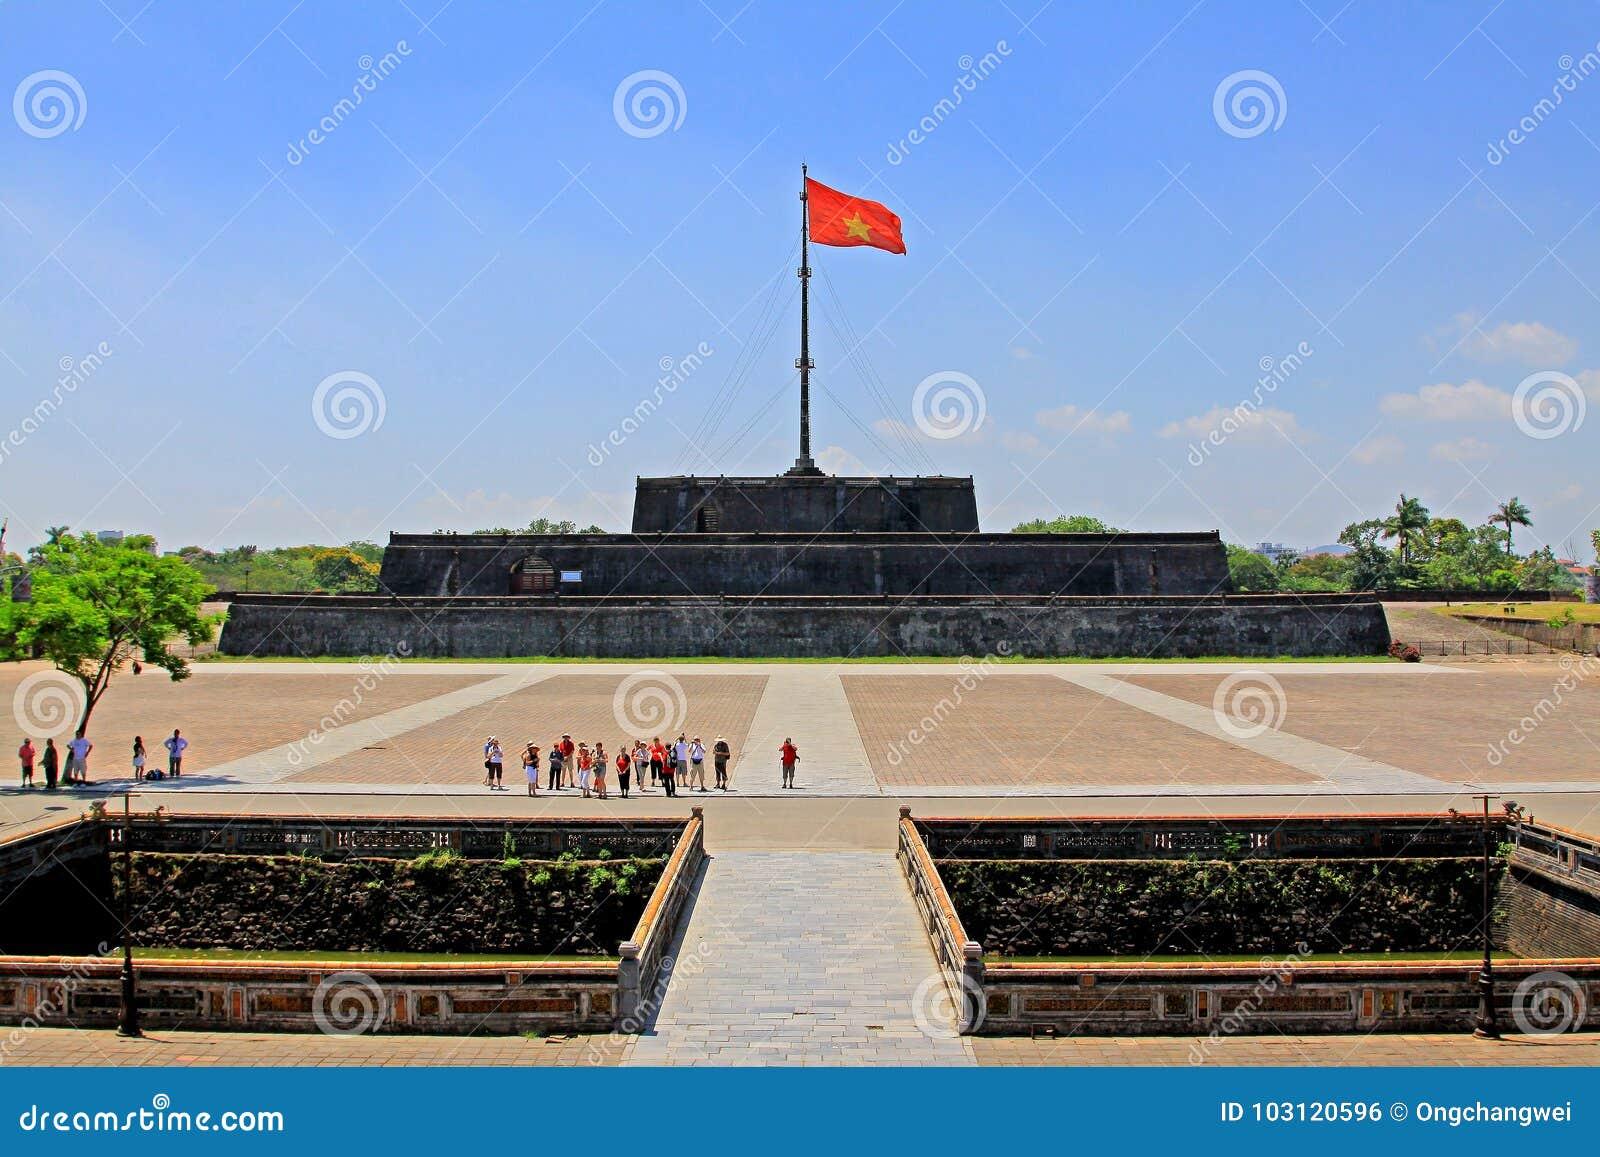 Flag Of Vietnam In Hue Imperial City, Vietnam UNESCO World Heritage